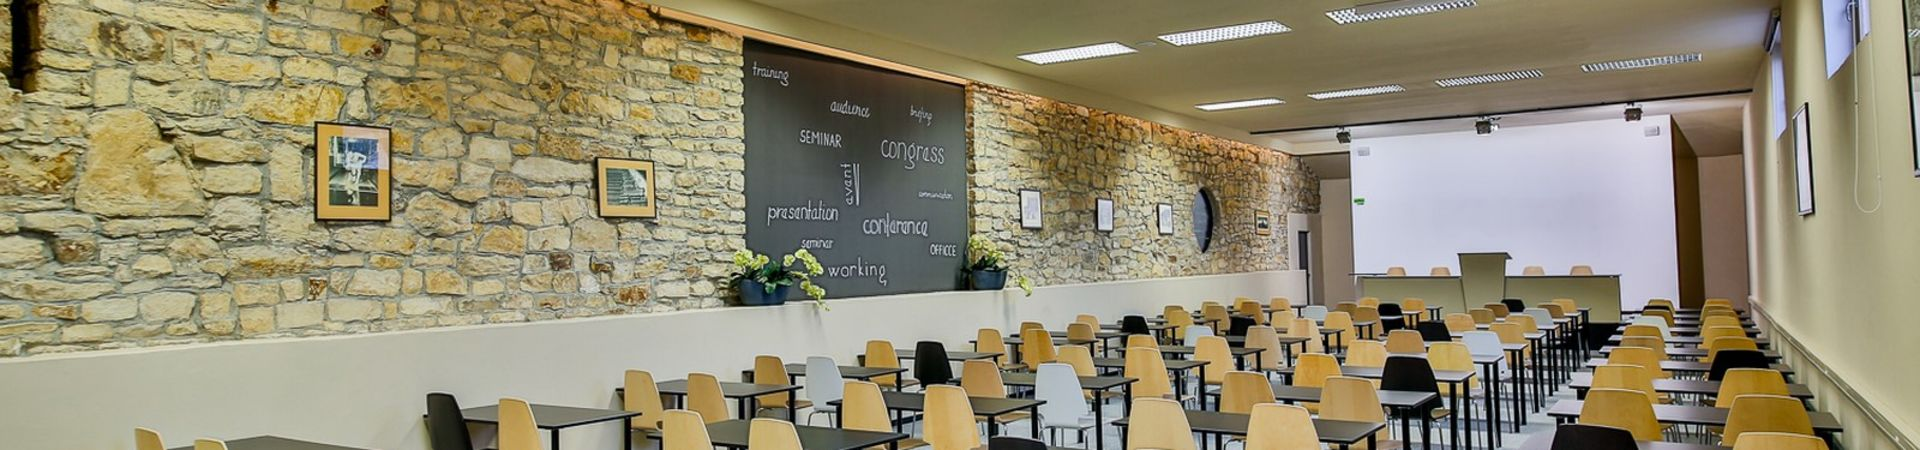 Relax park Modrá Stodola - Kongresový sál